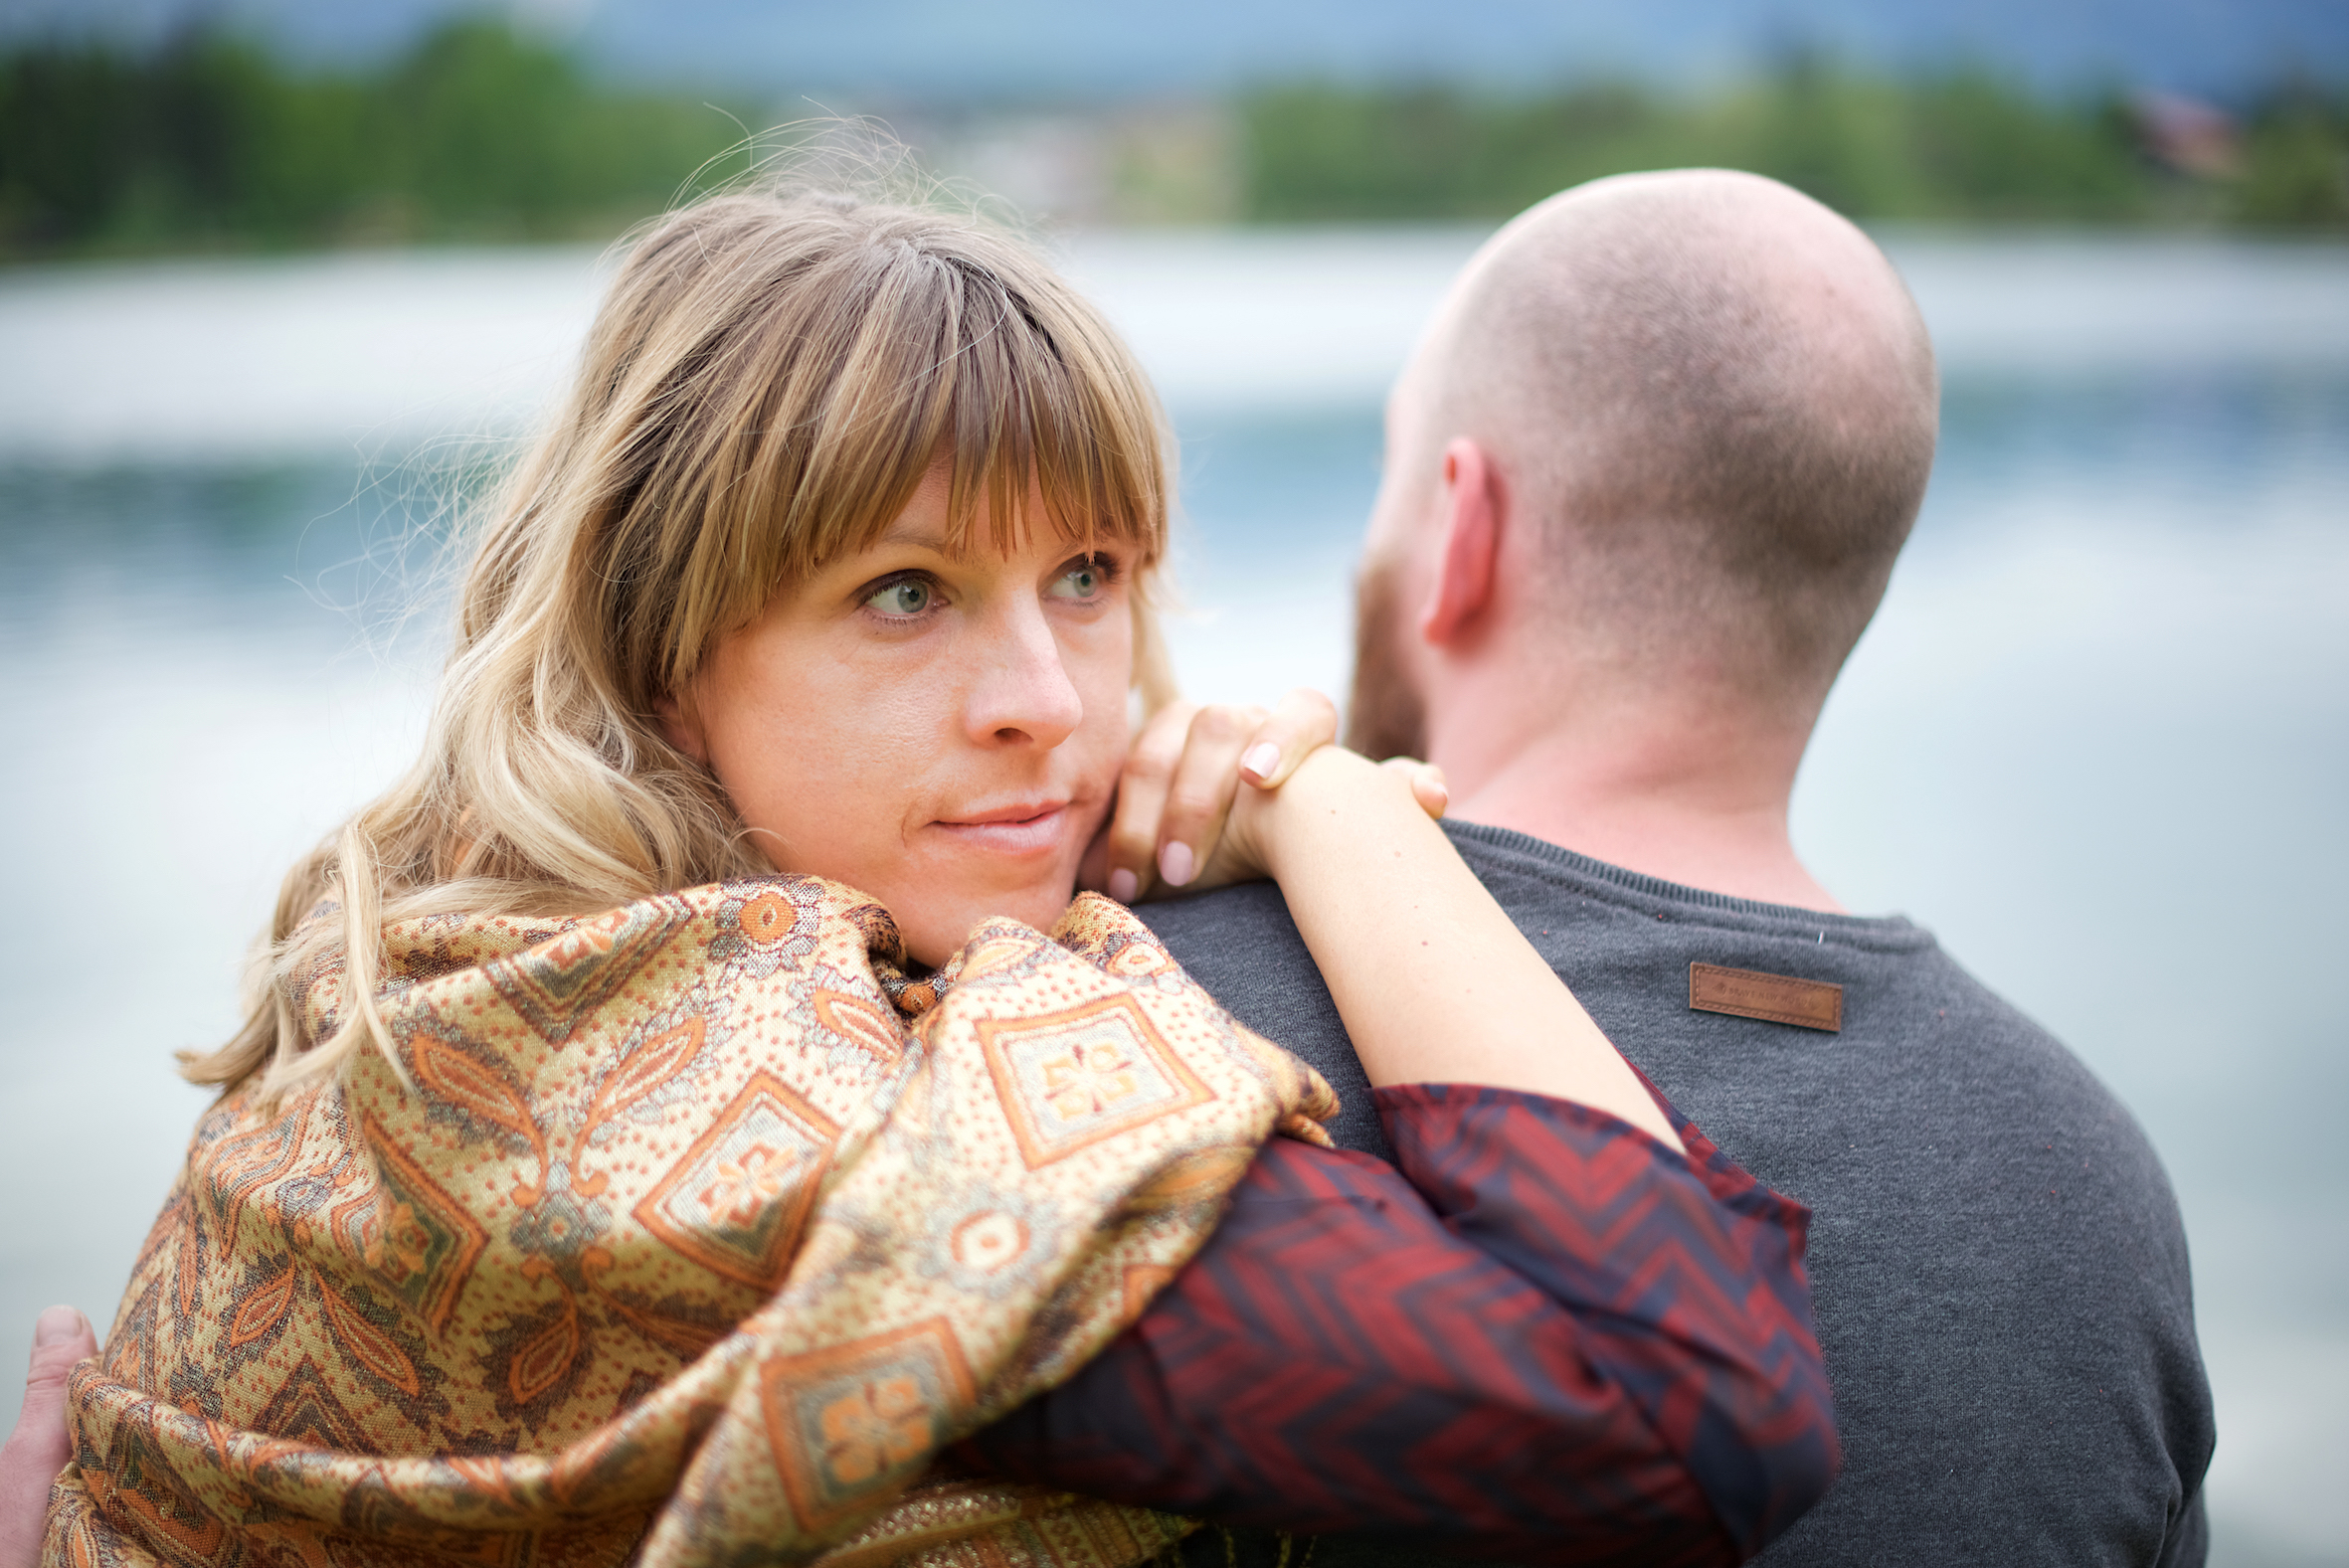 Ausstrahlung verbessern flirten